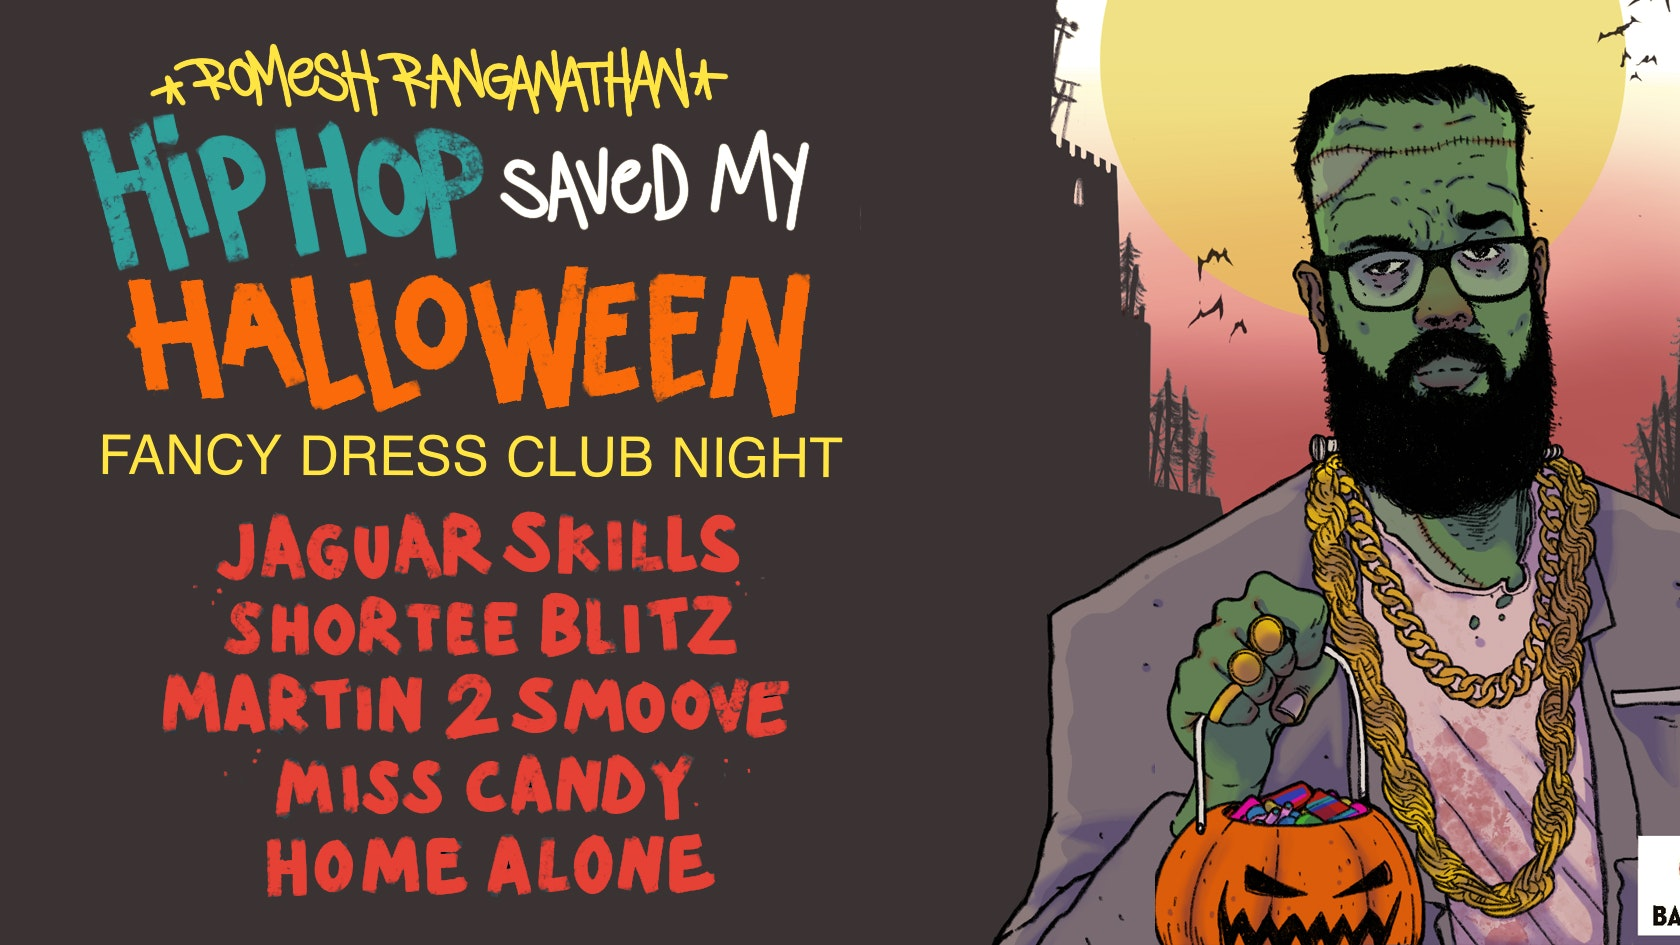 Romesh Ranganathan x HollerBack : HipHop Saved My Halloween – Lafayette London